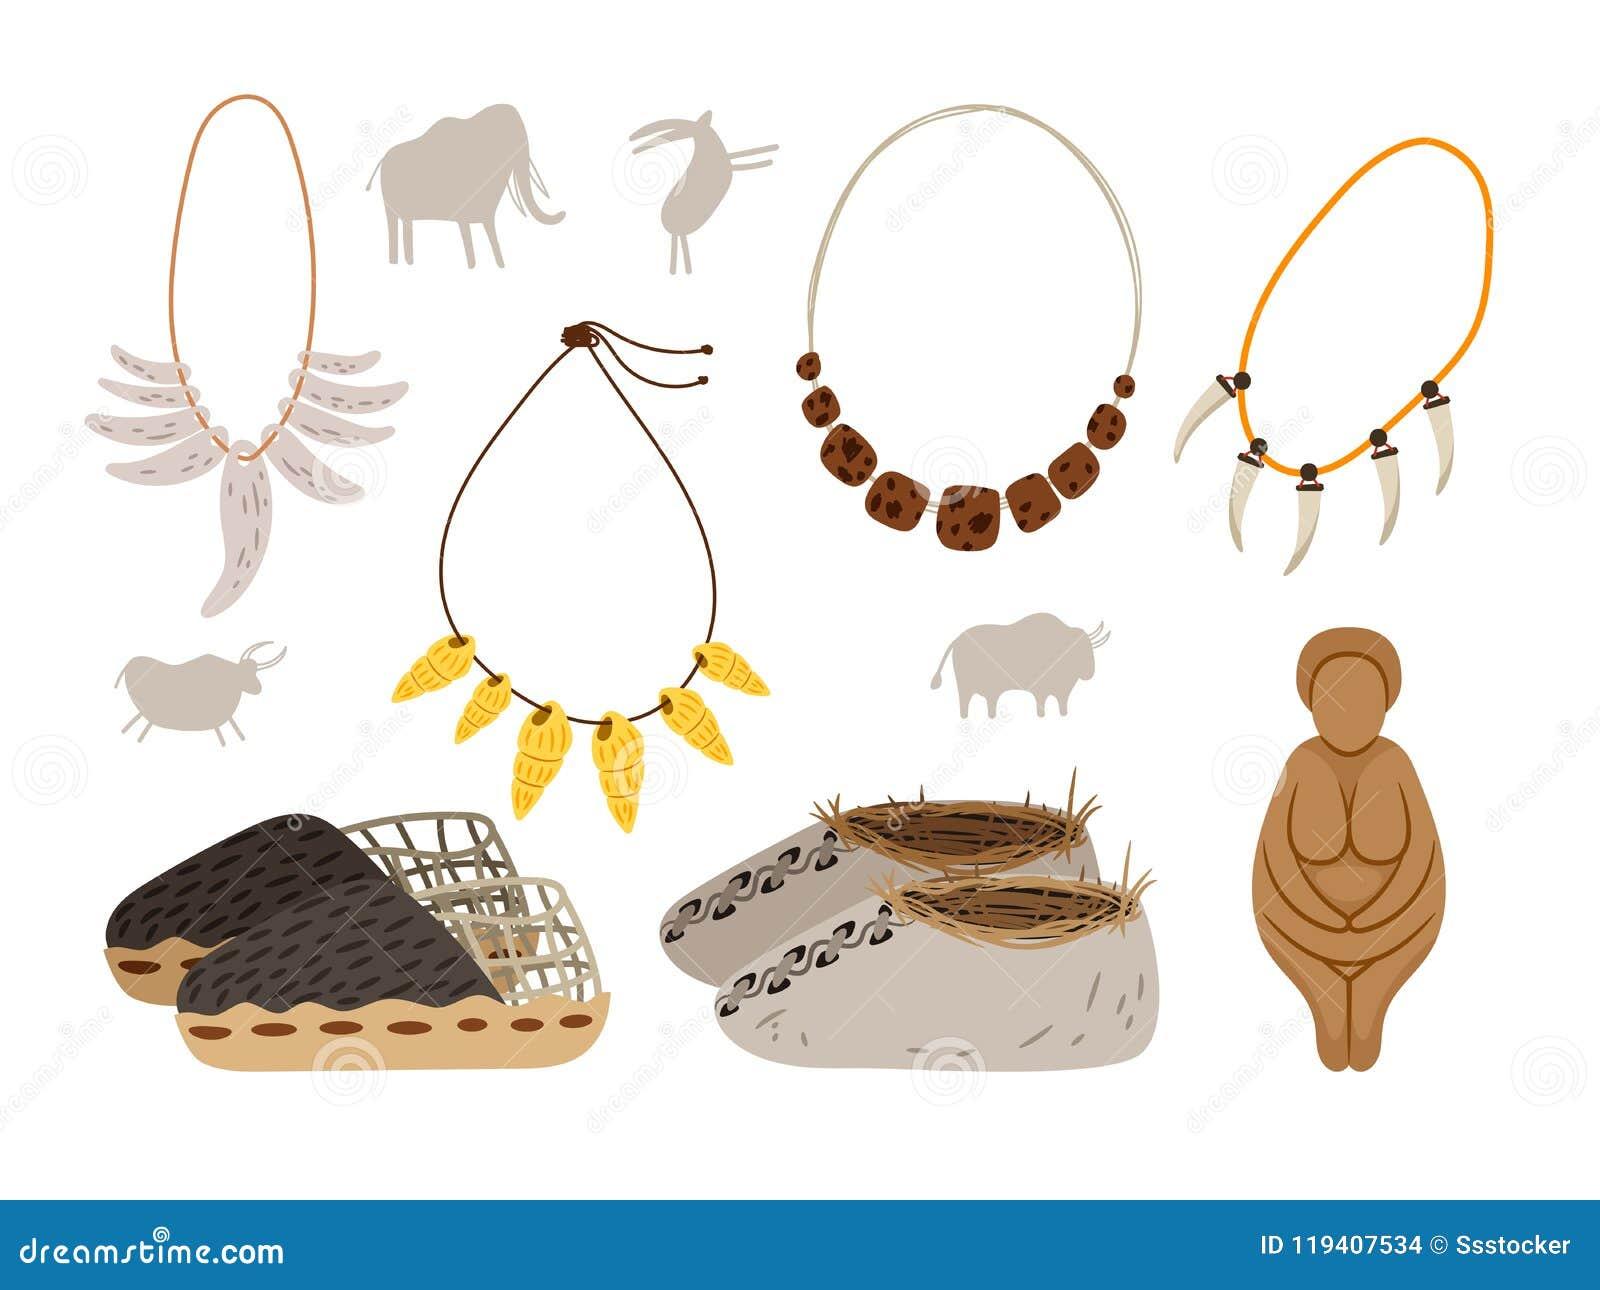 Ice age cartoon elements stock vector. Illustration of animal ...